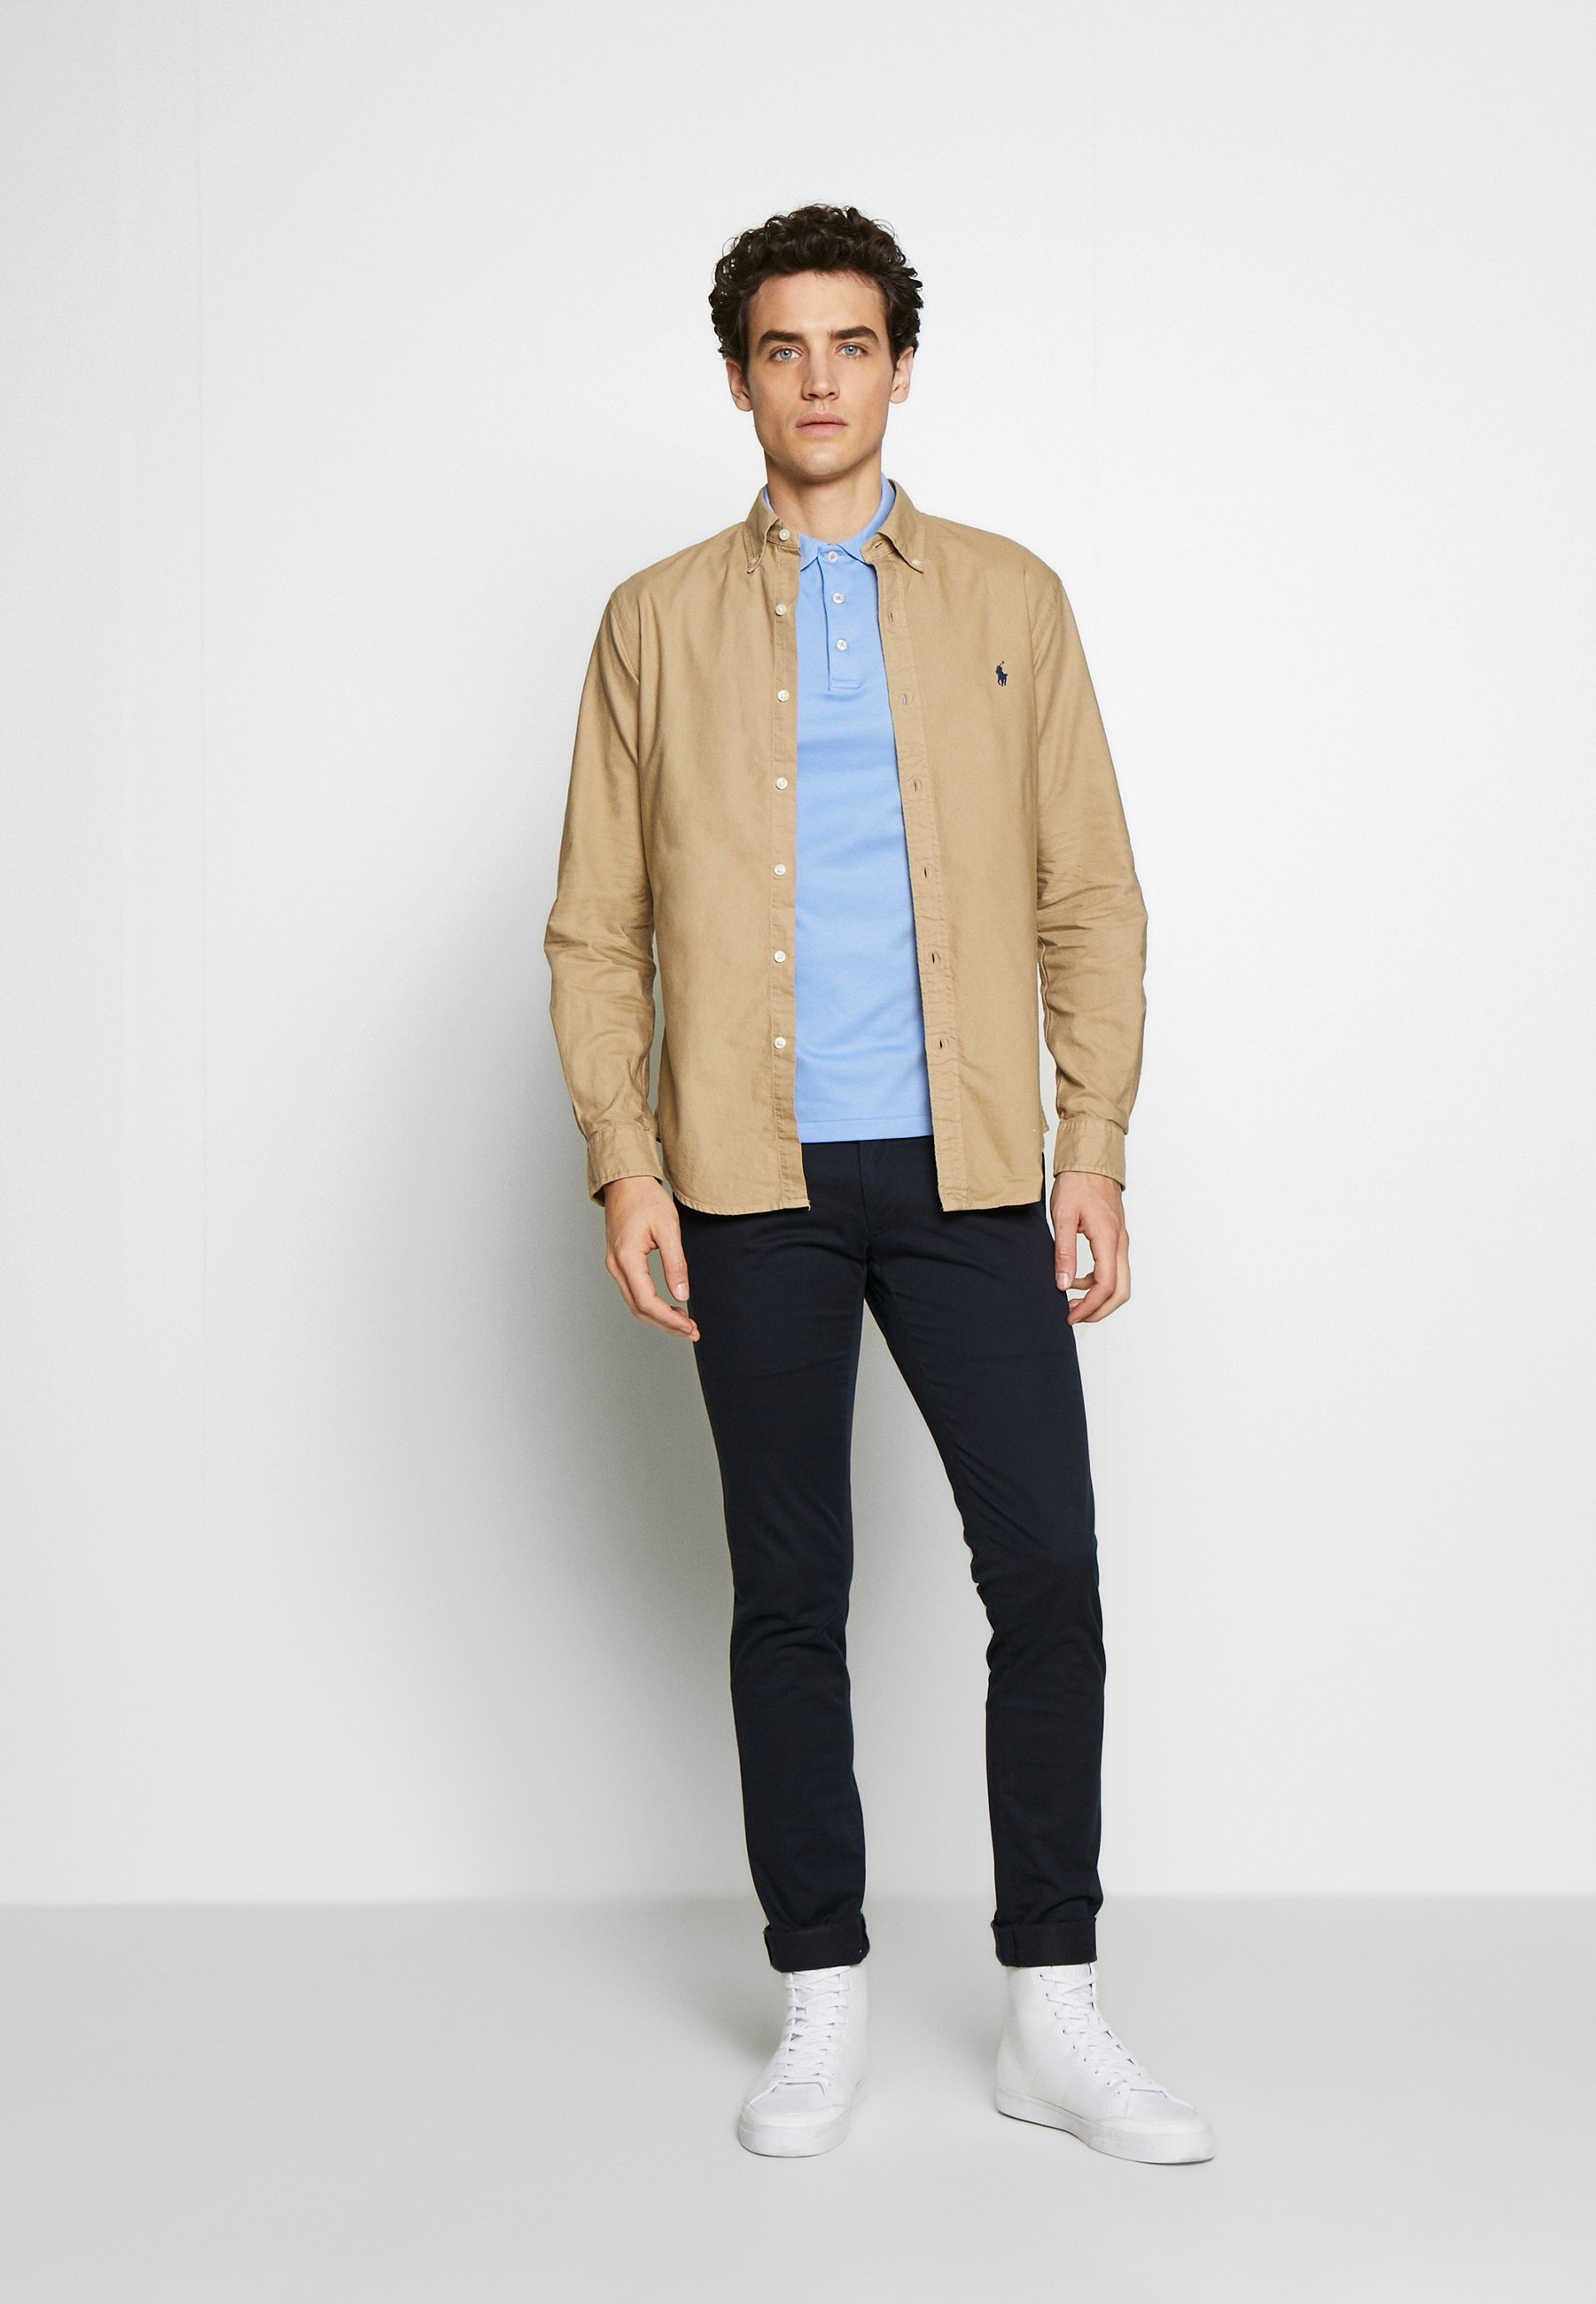 Polo Ralph Lauren Oxford - Shirt Surrey Tan